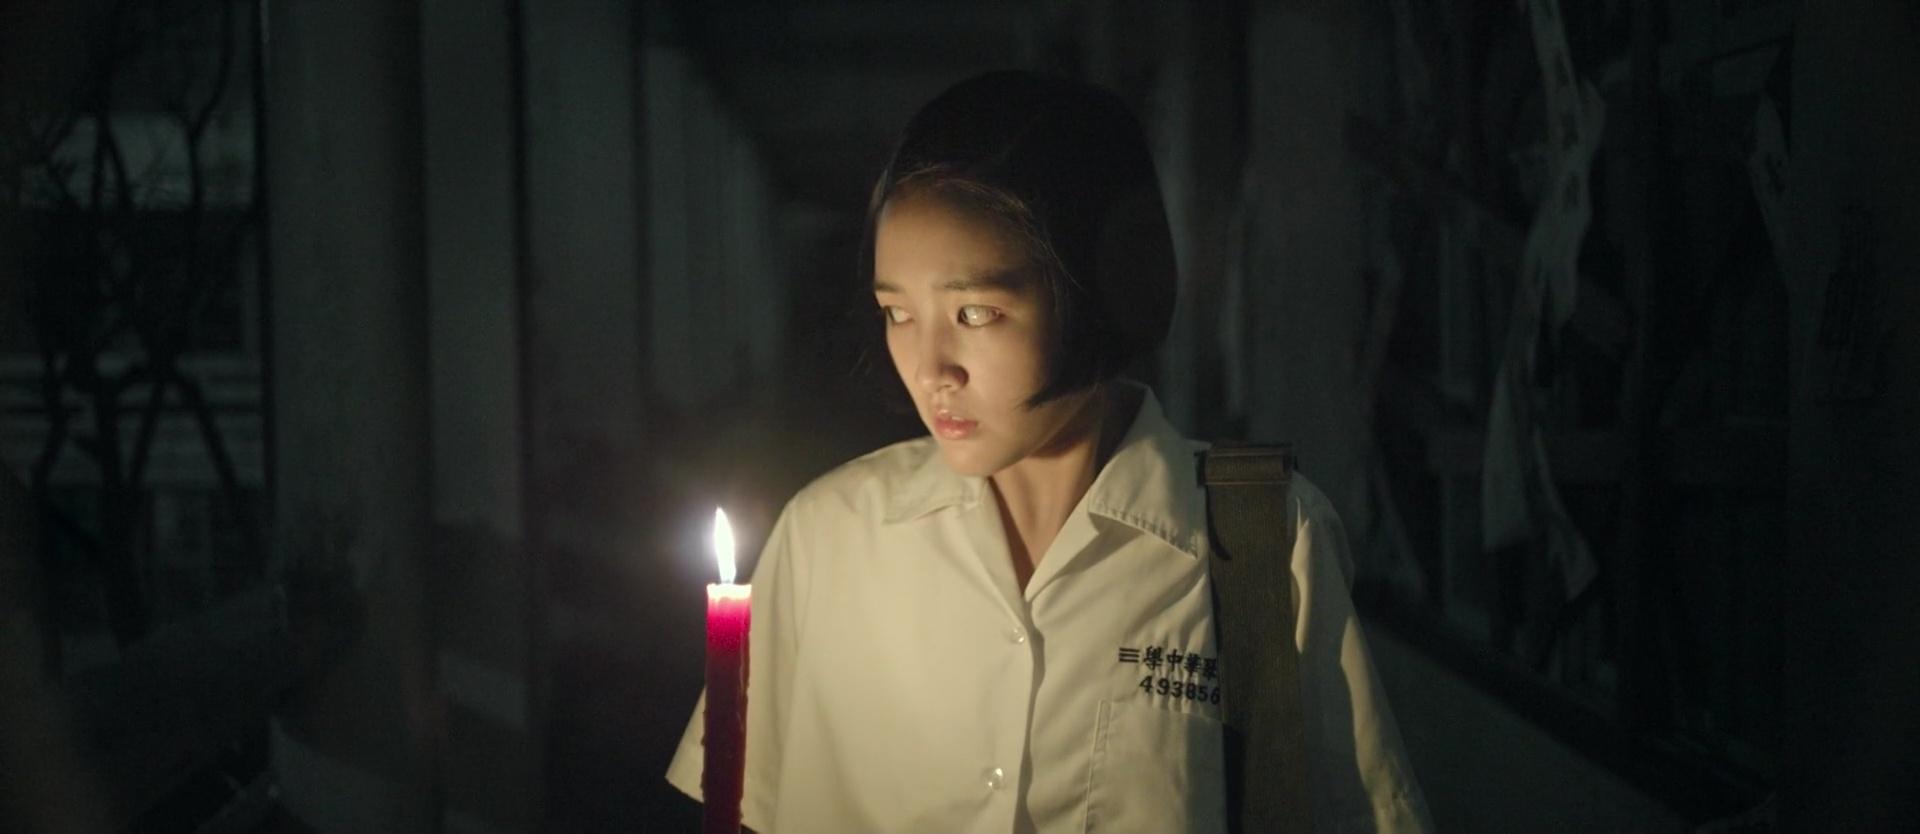 DETENTION (返校) de John Hsu (2019)